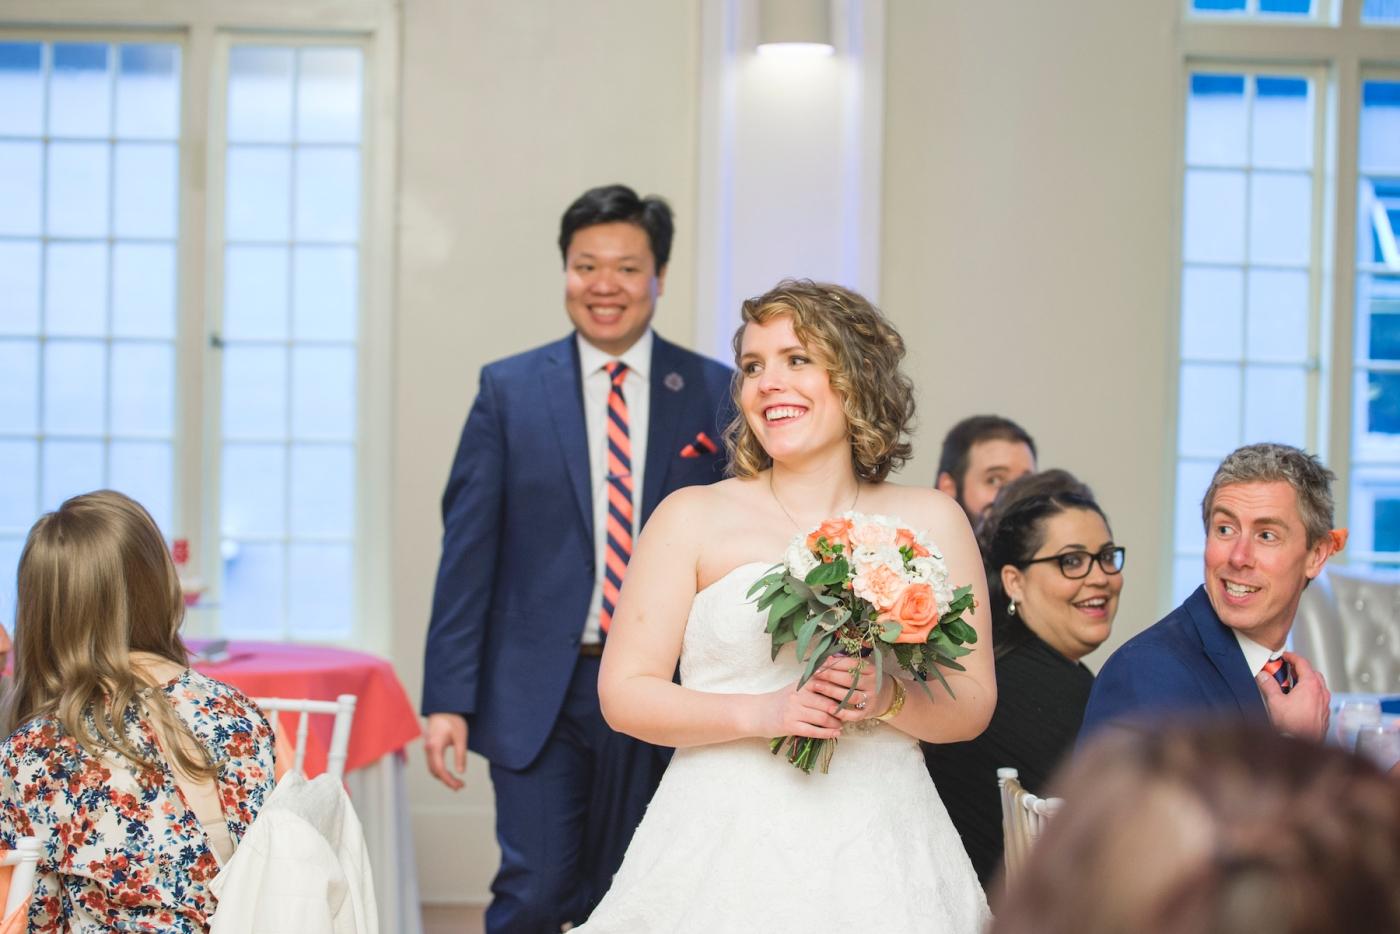 DSC_3161Everett_Wedding_Ballroom_Jane_Speleers_photography_Rachel_and_Edmund_reception_2017